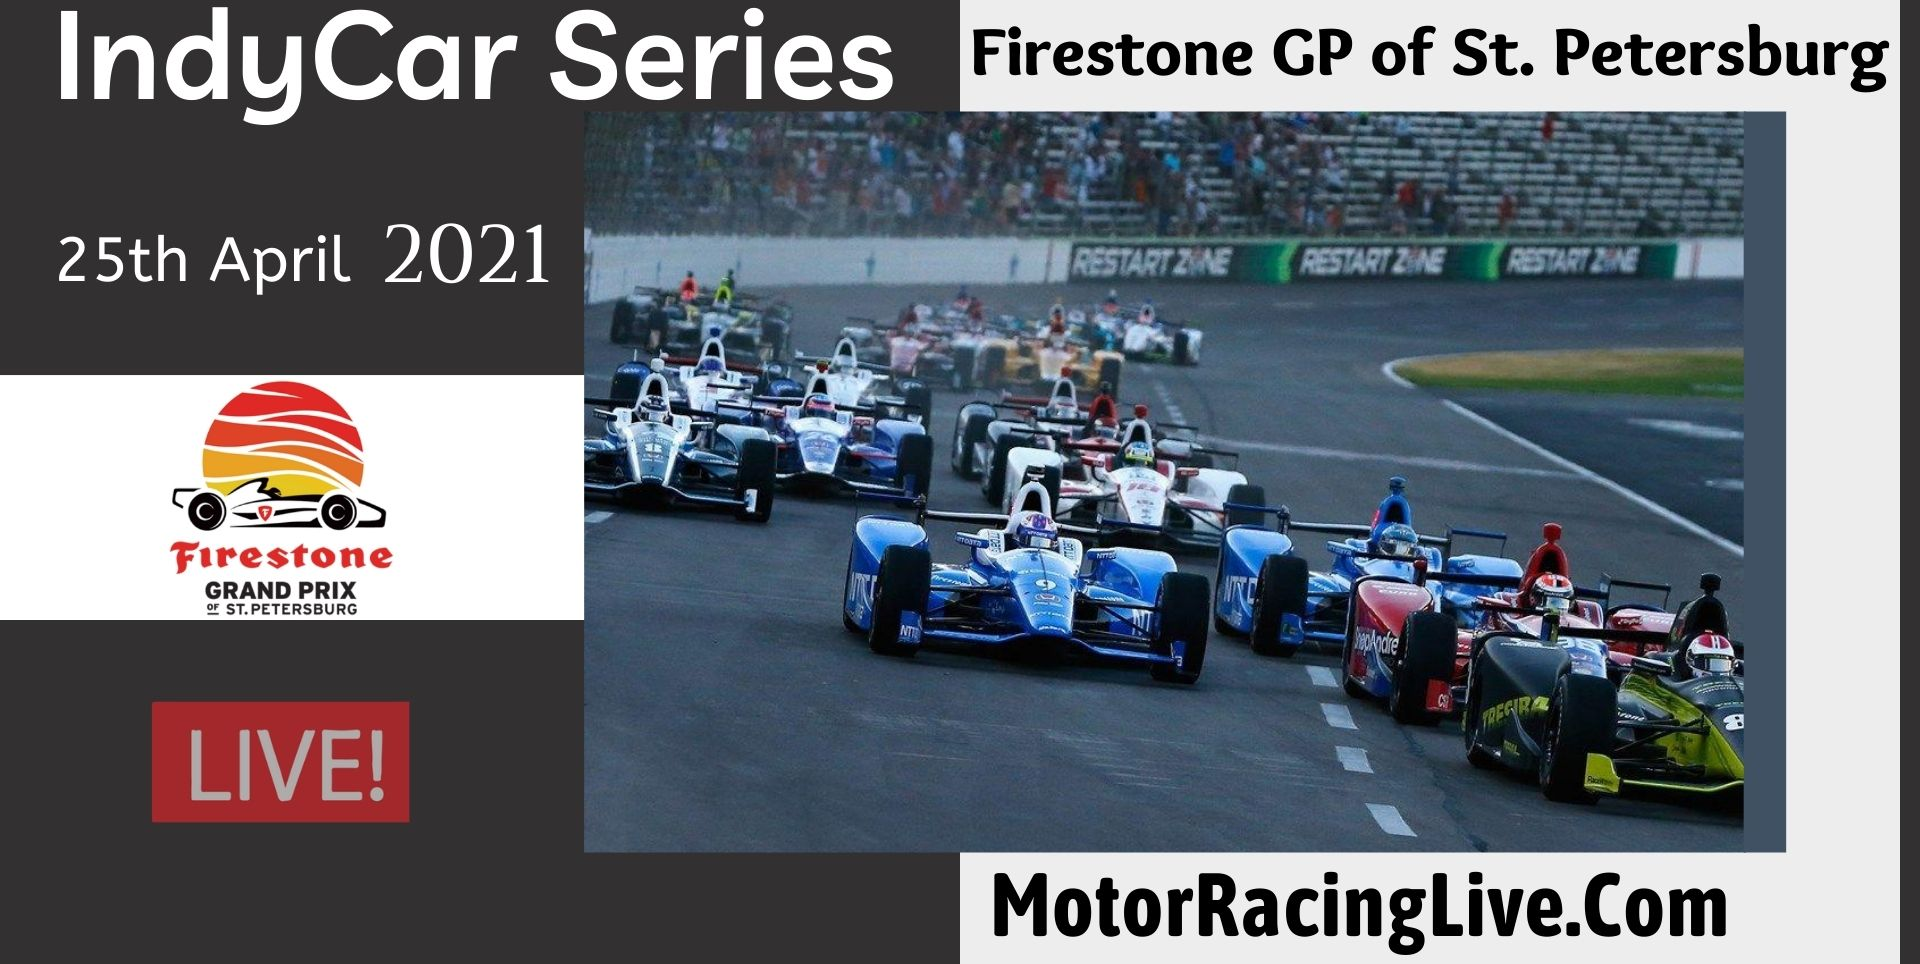 Firestone GP Of St. Petersburg Live Stream 2021 | Indycar